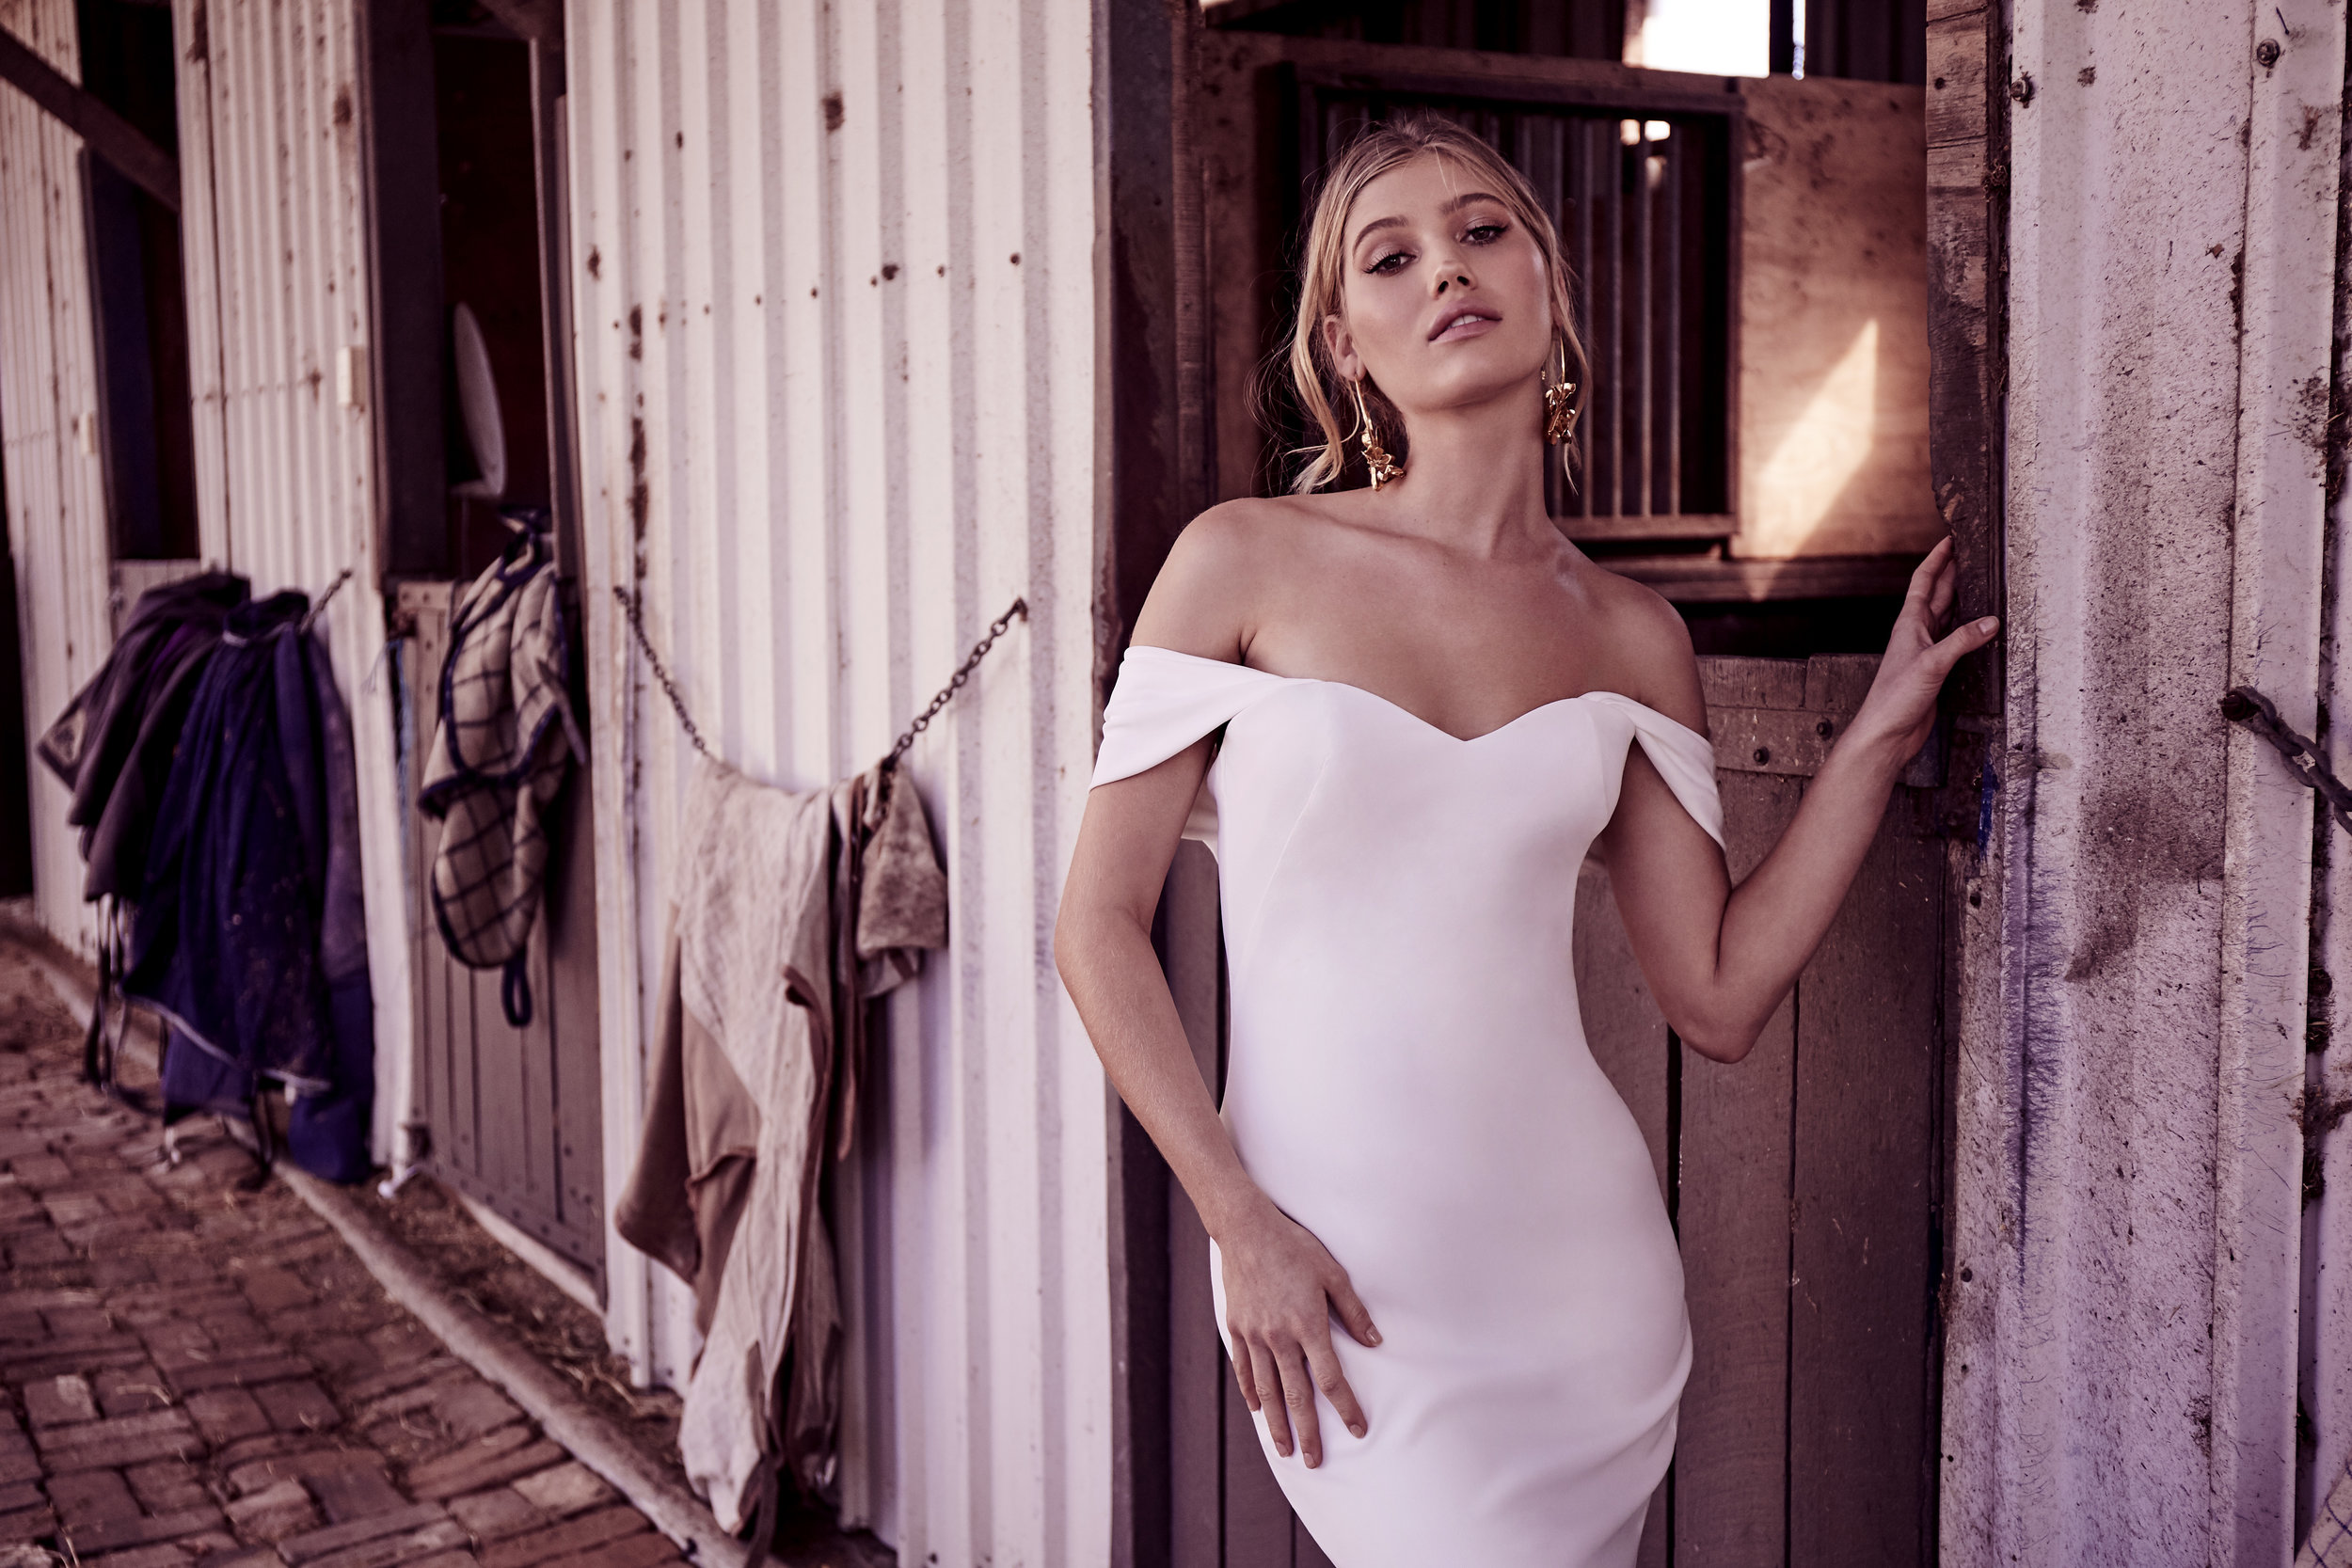 Wedding Dresses - Off Shoulder White Cotton Dress